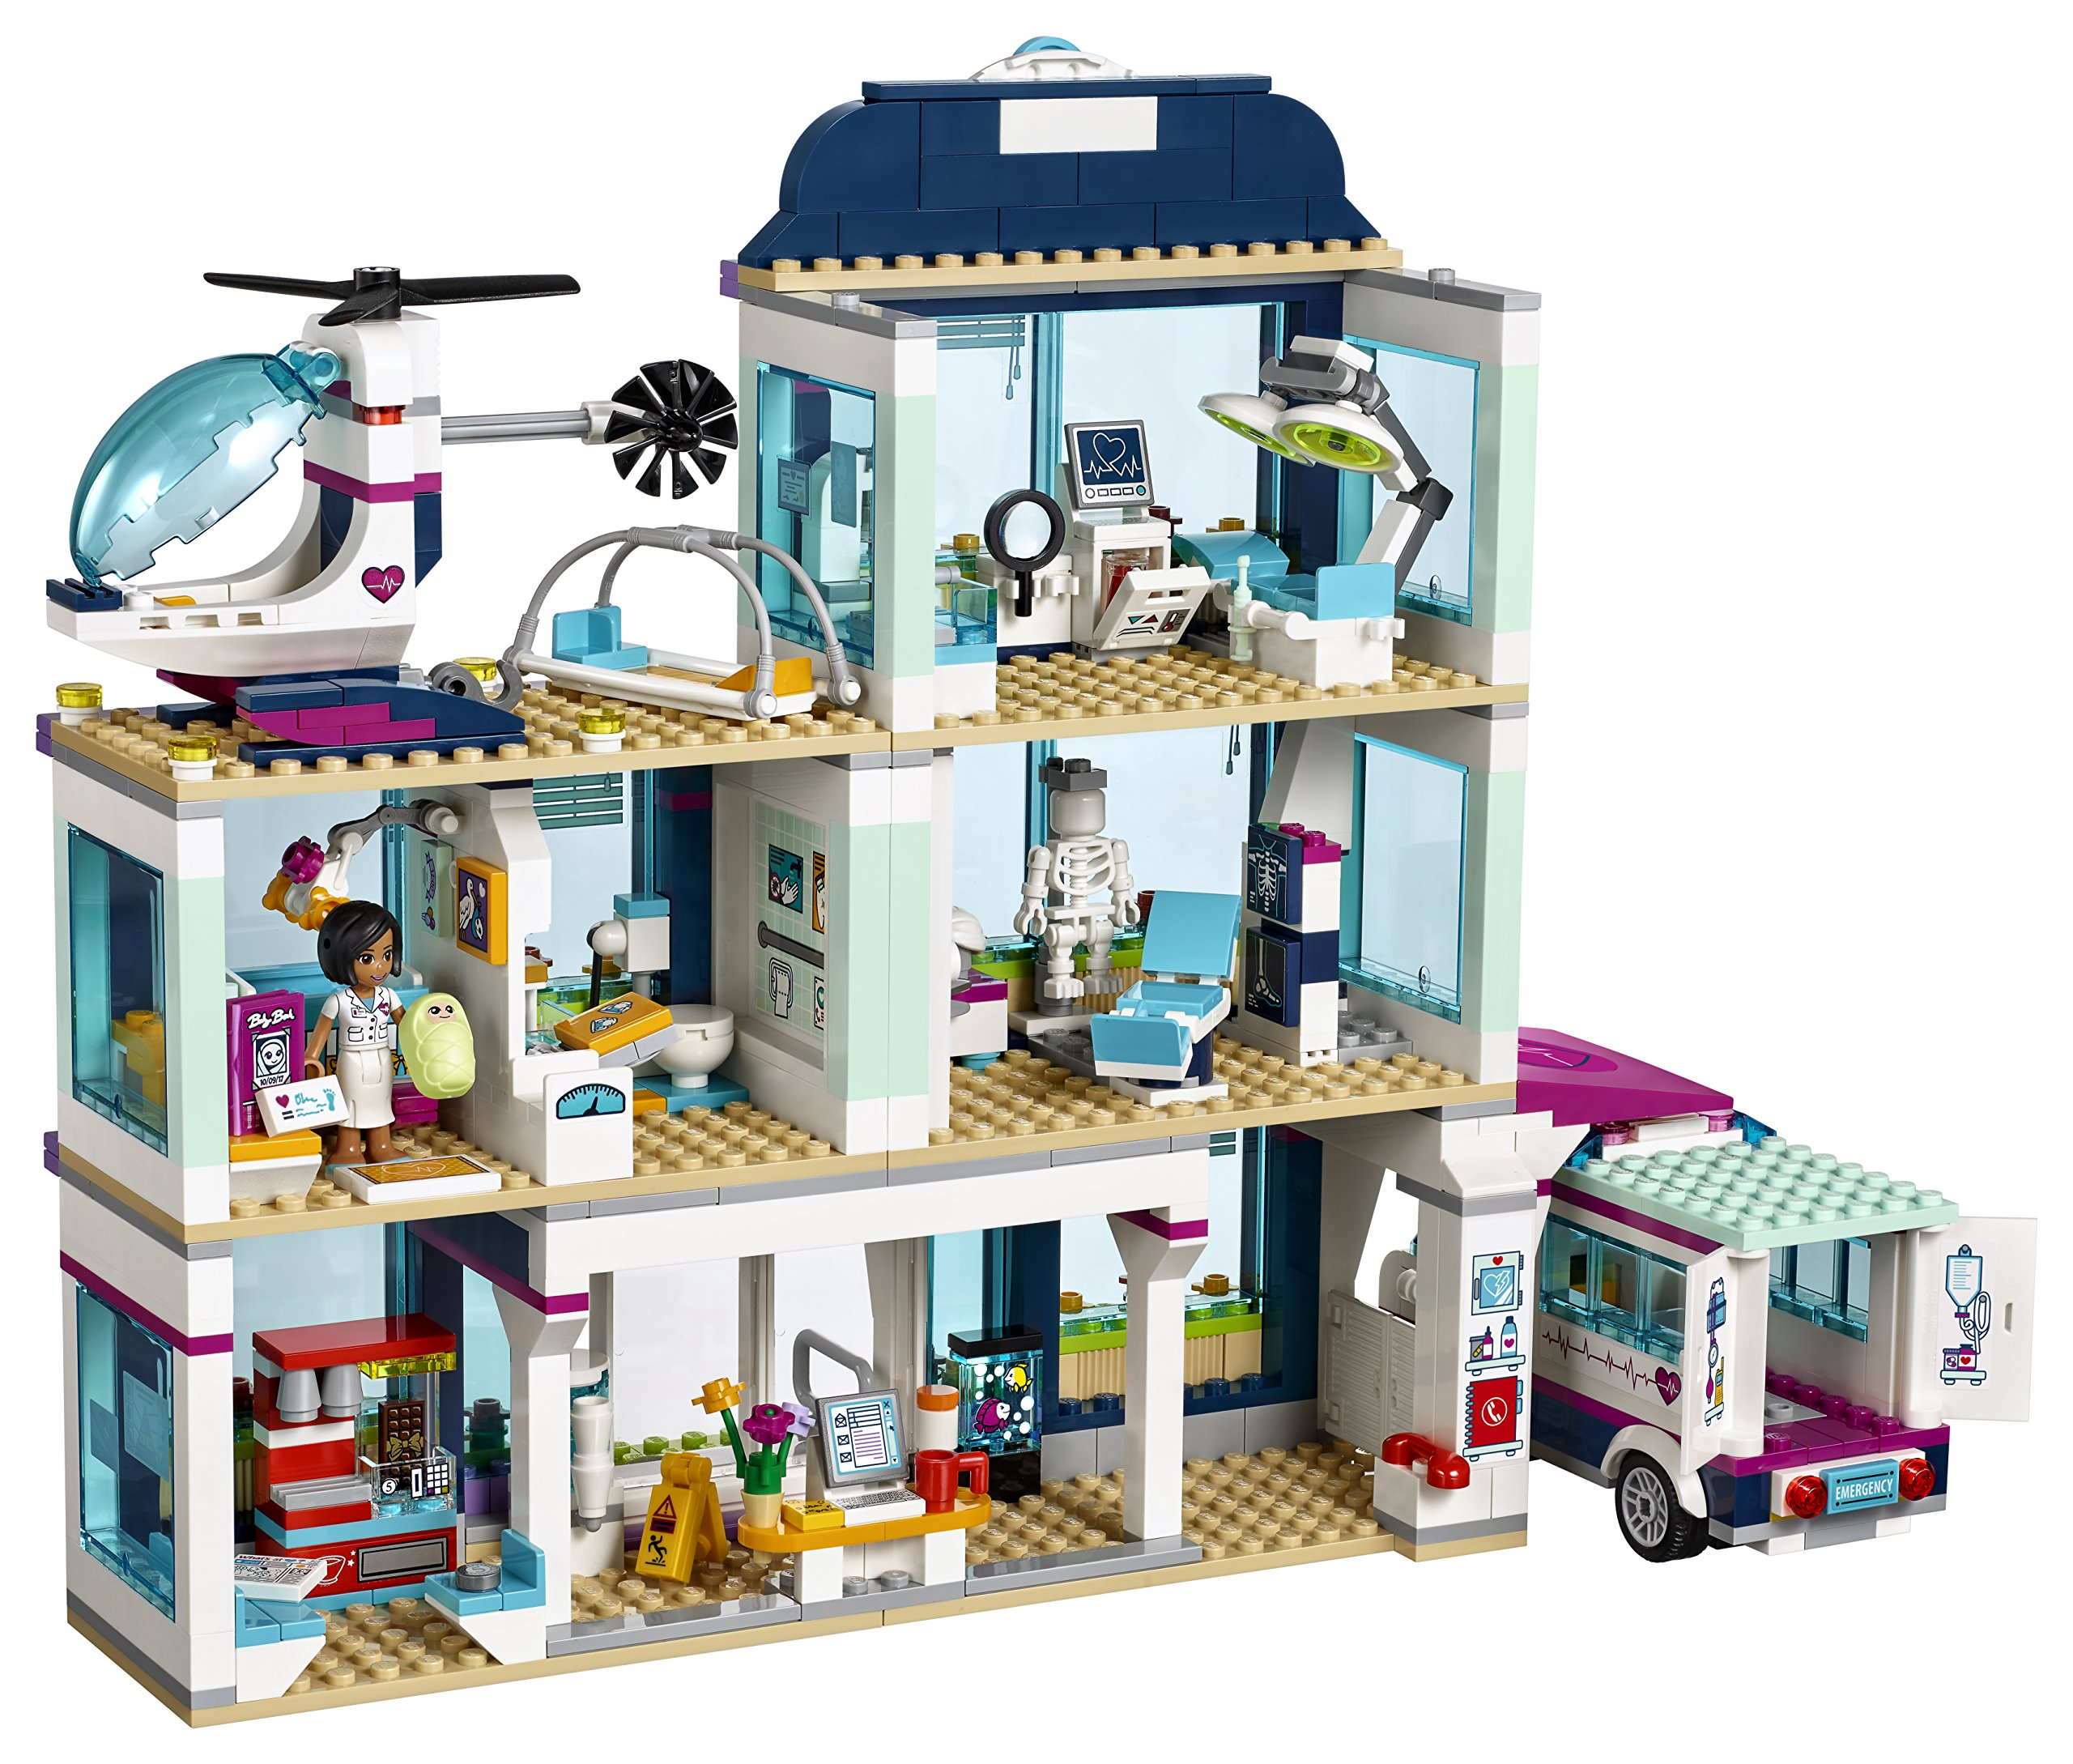 LEGO Friends Heartlake Hospital 41318 Building Kit (871 Piece) by LEGO (Image #8)